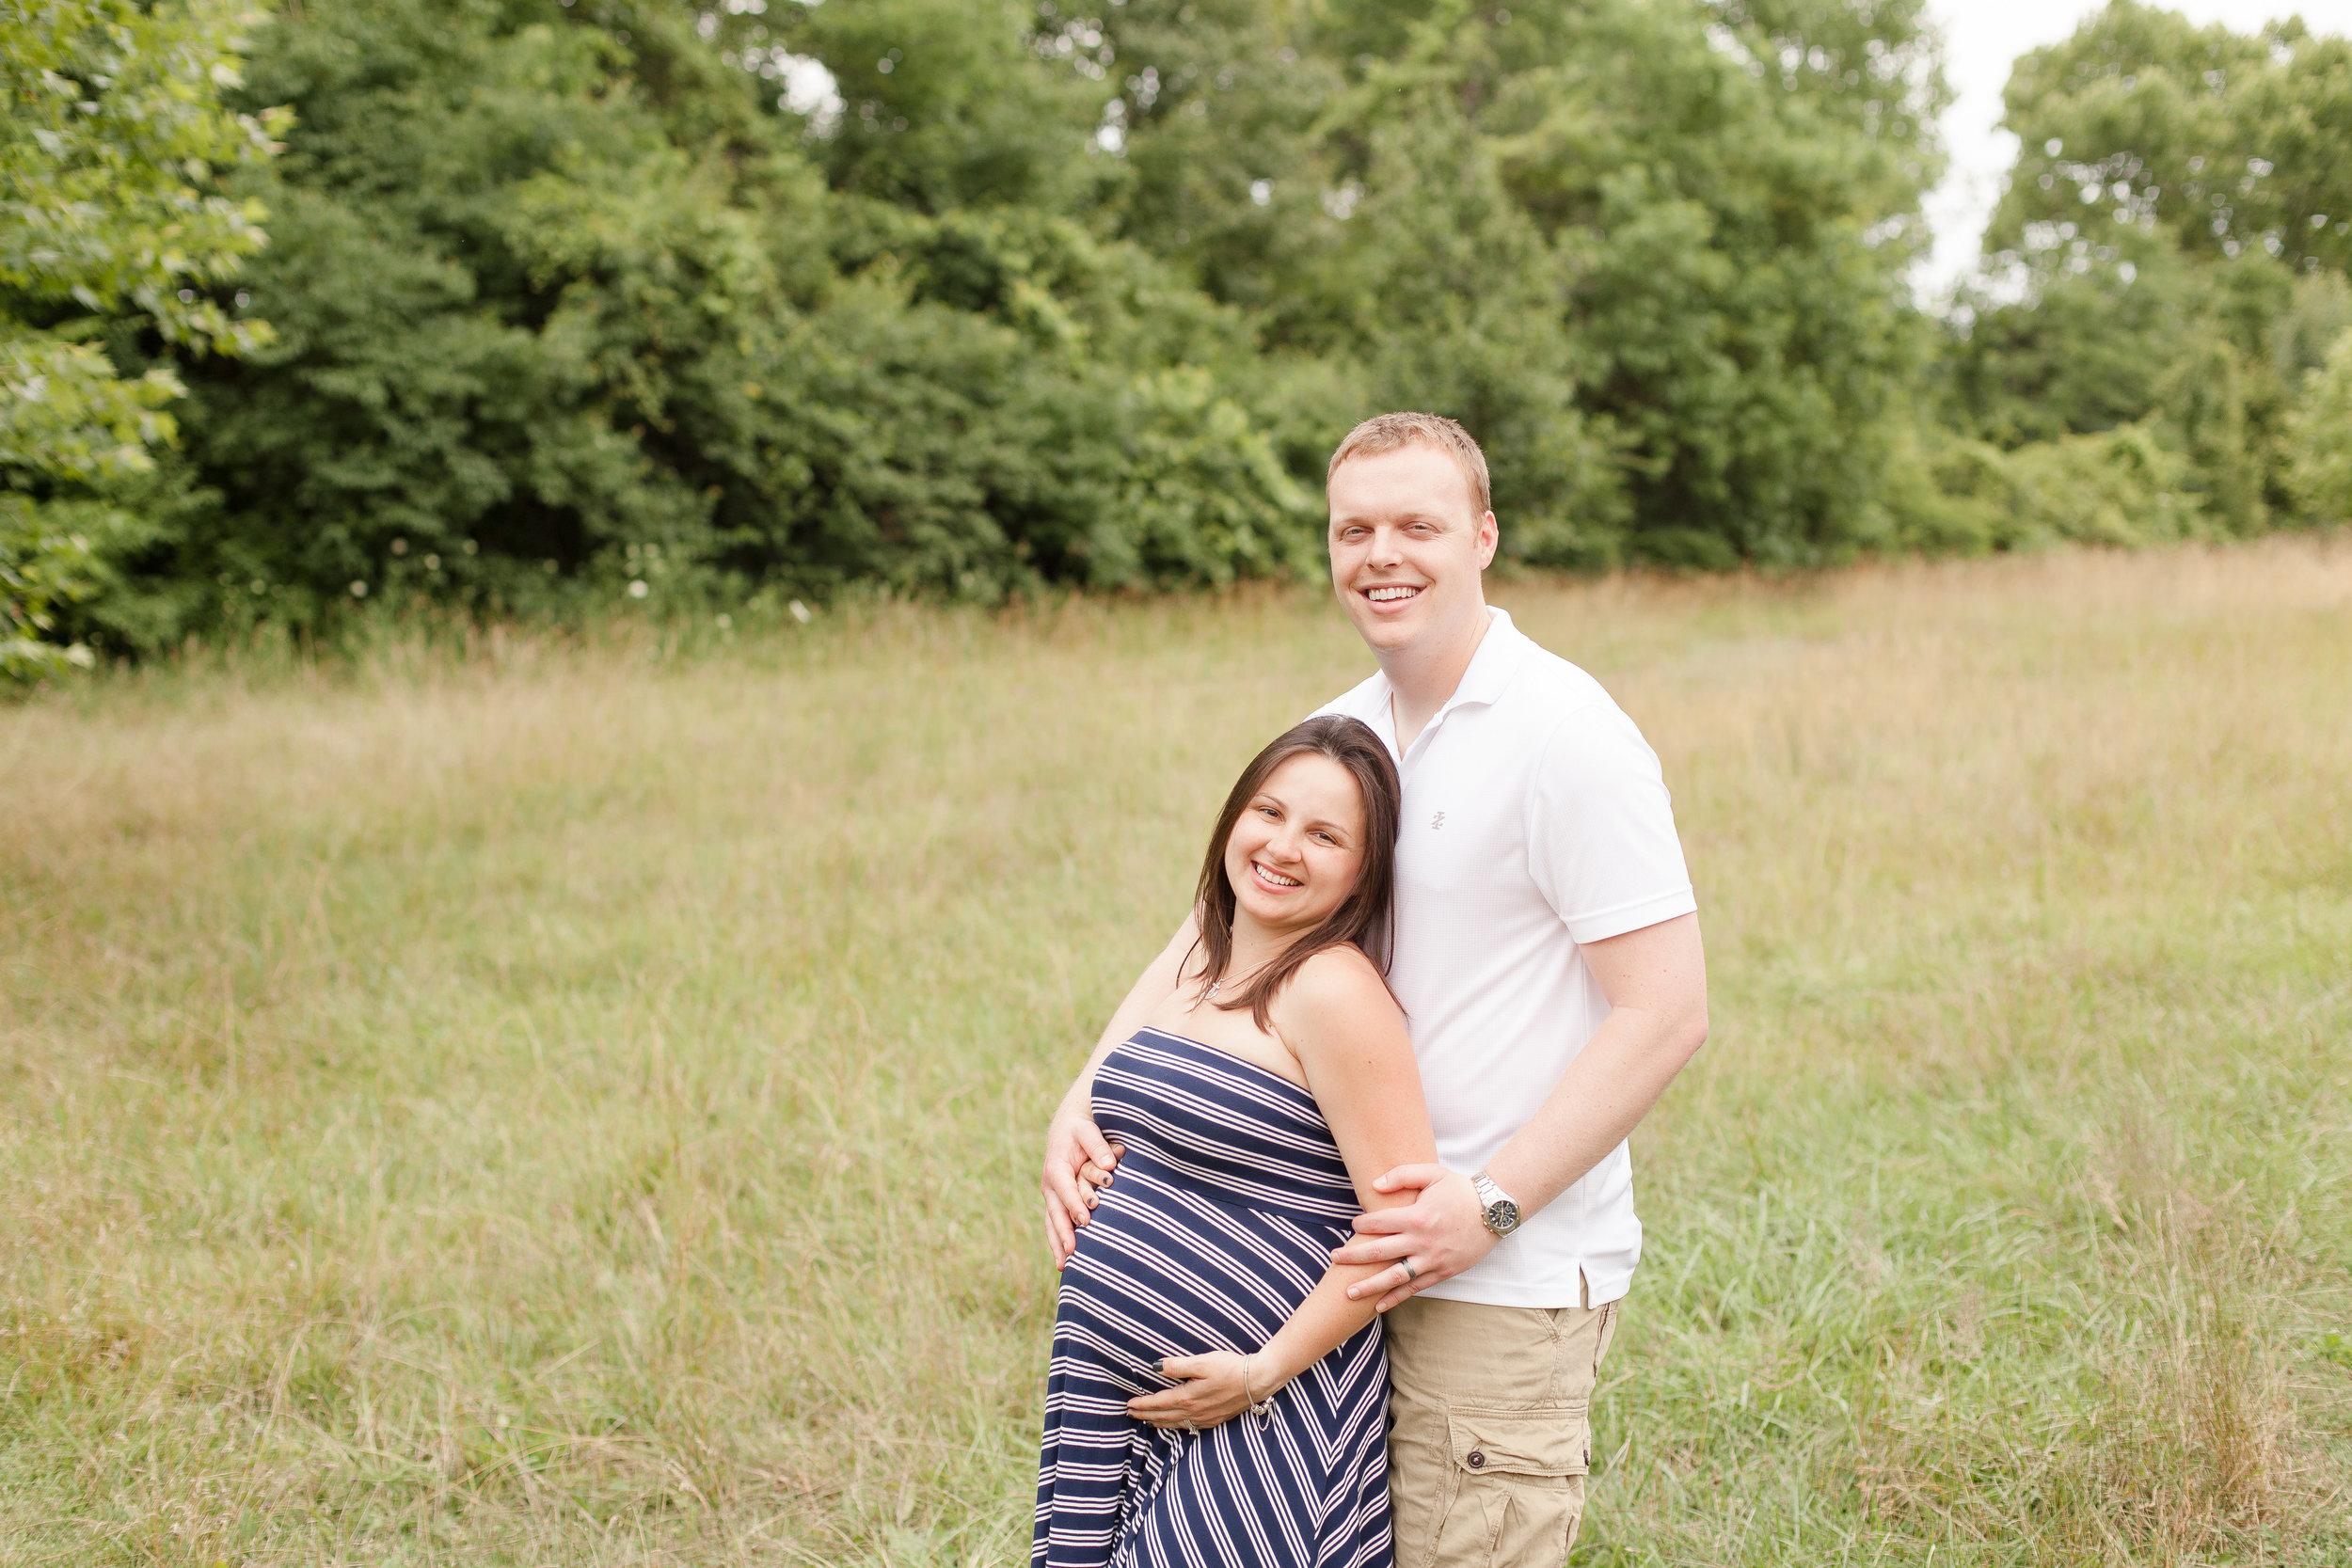 Sarah Cropper Photography | Columbus, Ohio Photographer | Columbus, Ohio Maternity Photography | Columbus, Ohio Newborn Photographer